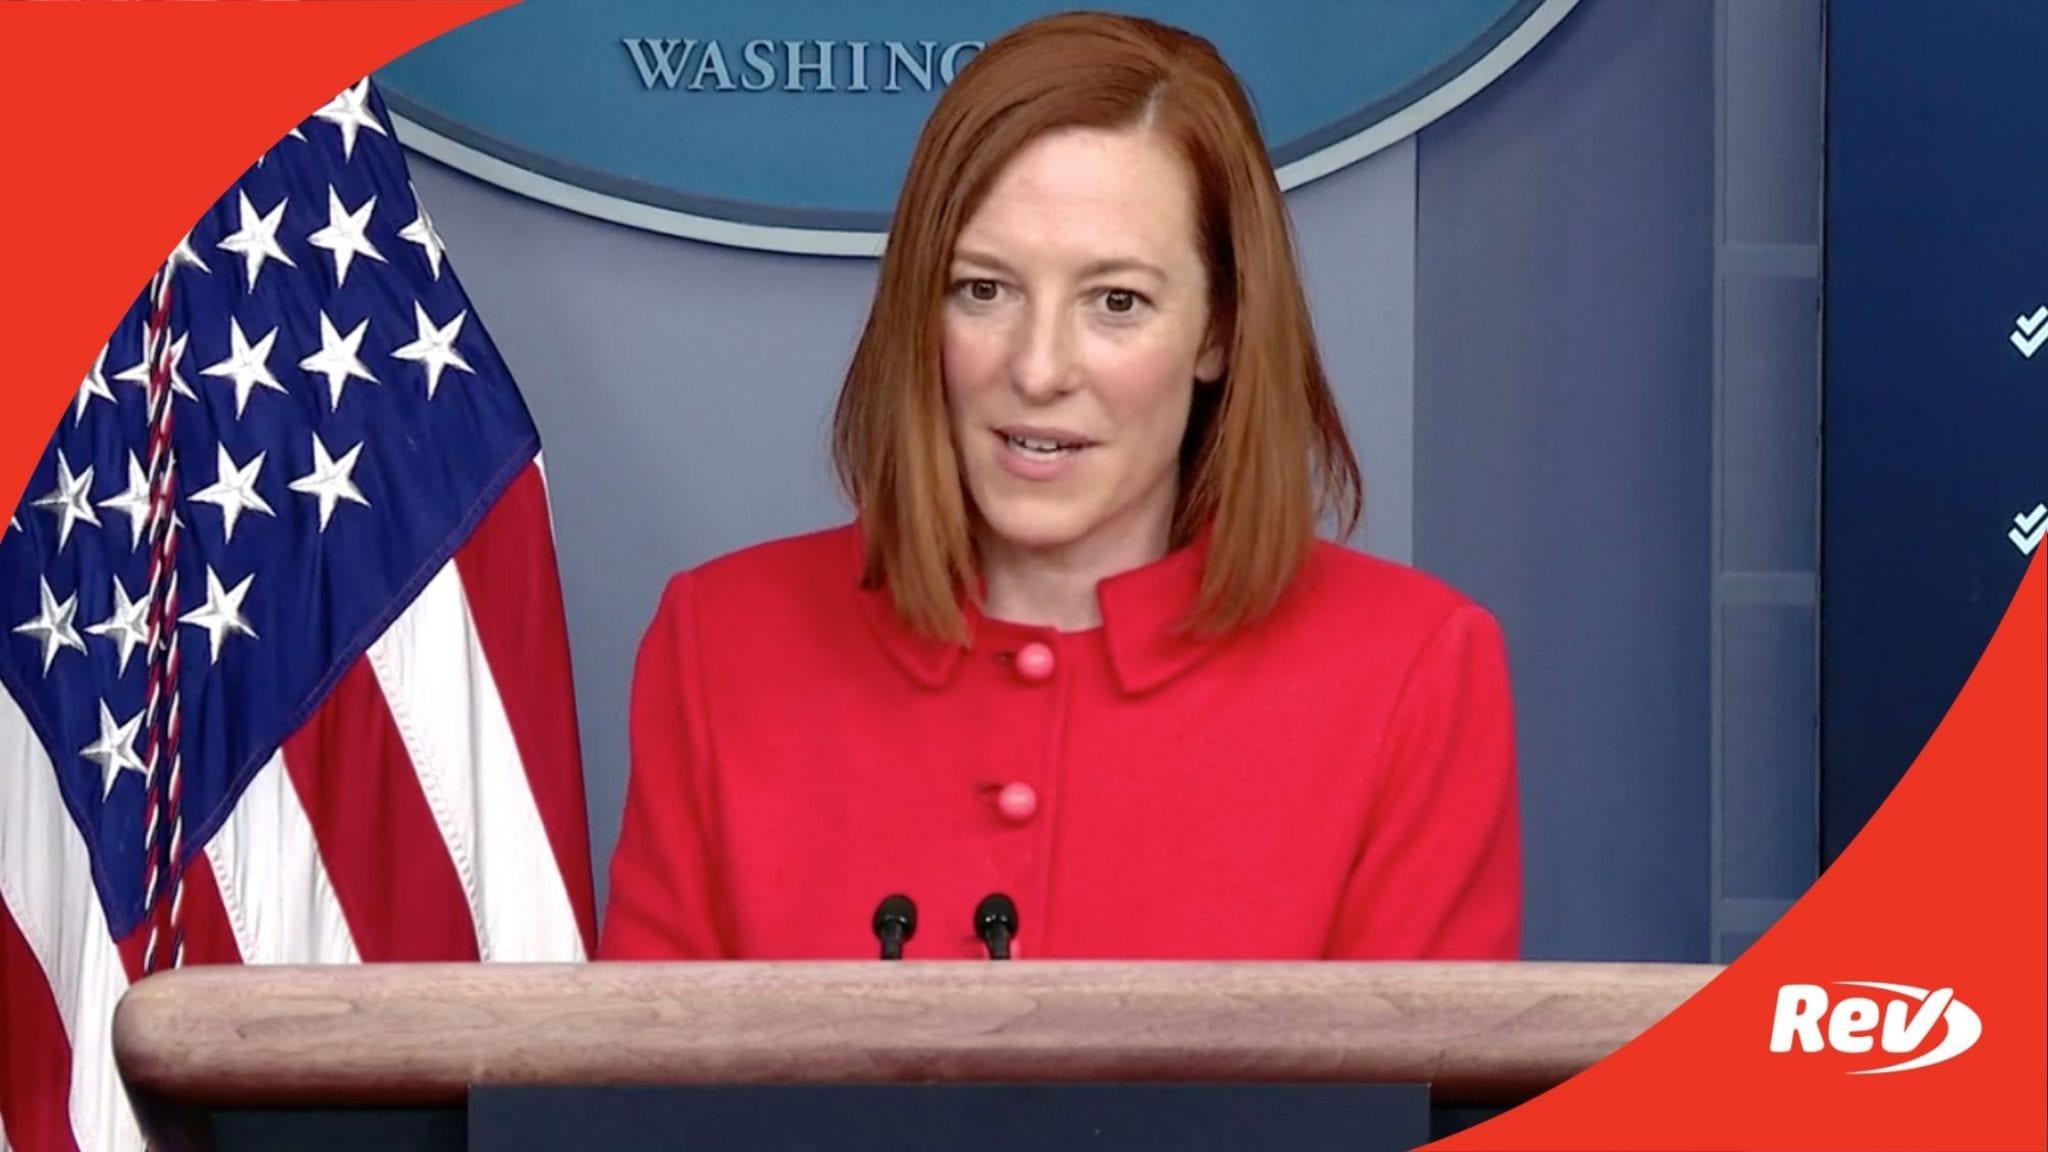 Press Secretary Jen Psaki White House Press Conference Call Transcript February 18